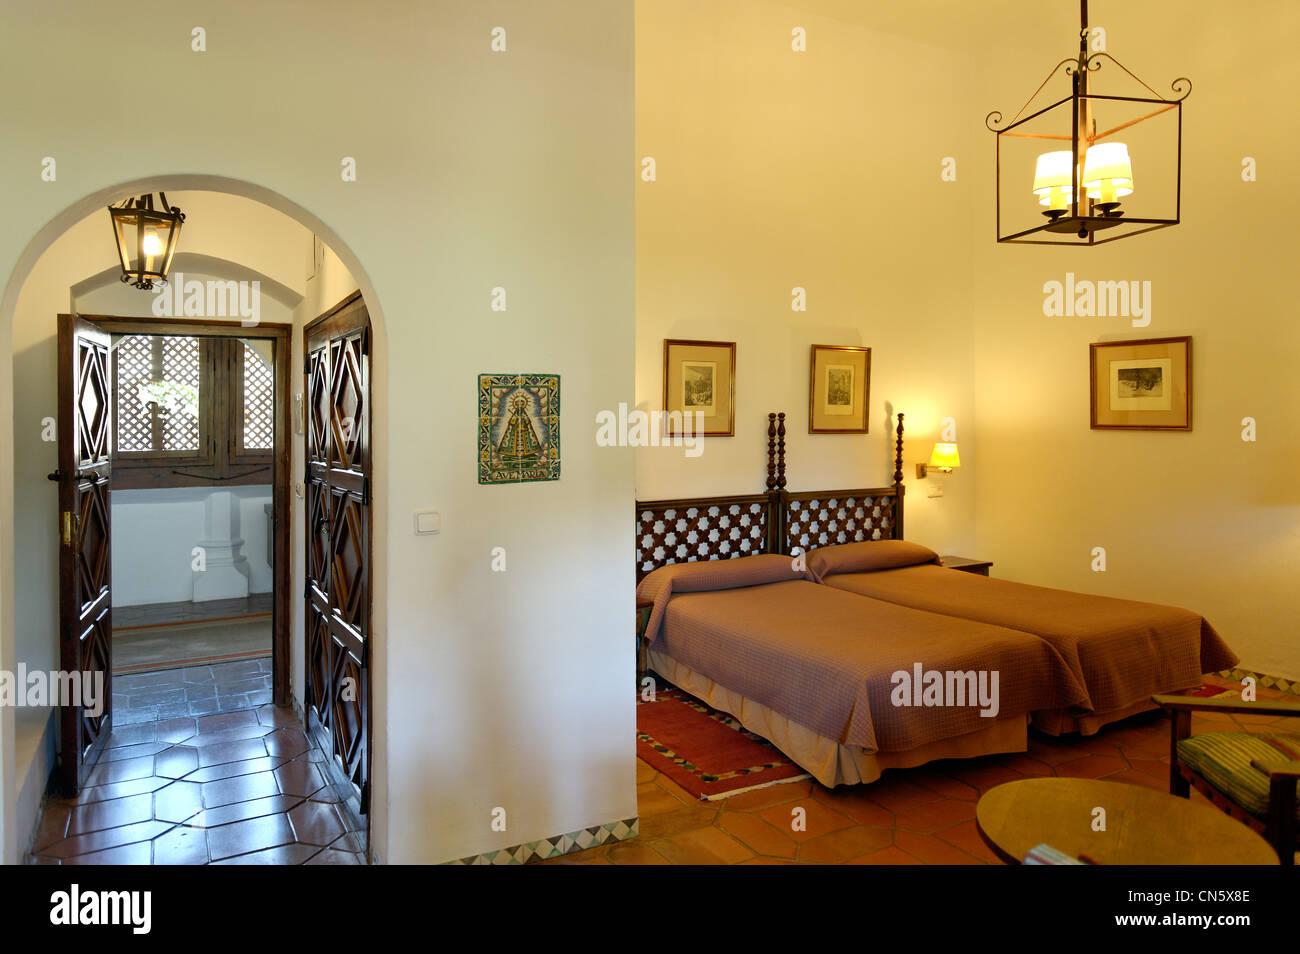 España, Extremadura, Guadalupe, Parador de Turismo, dormitorio Imagen De Stock